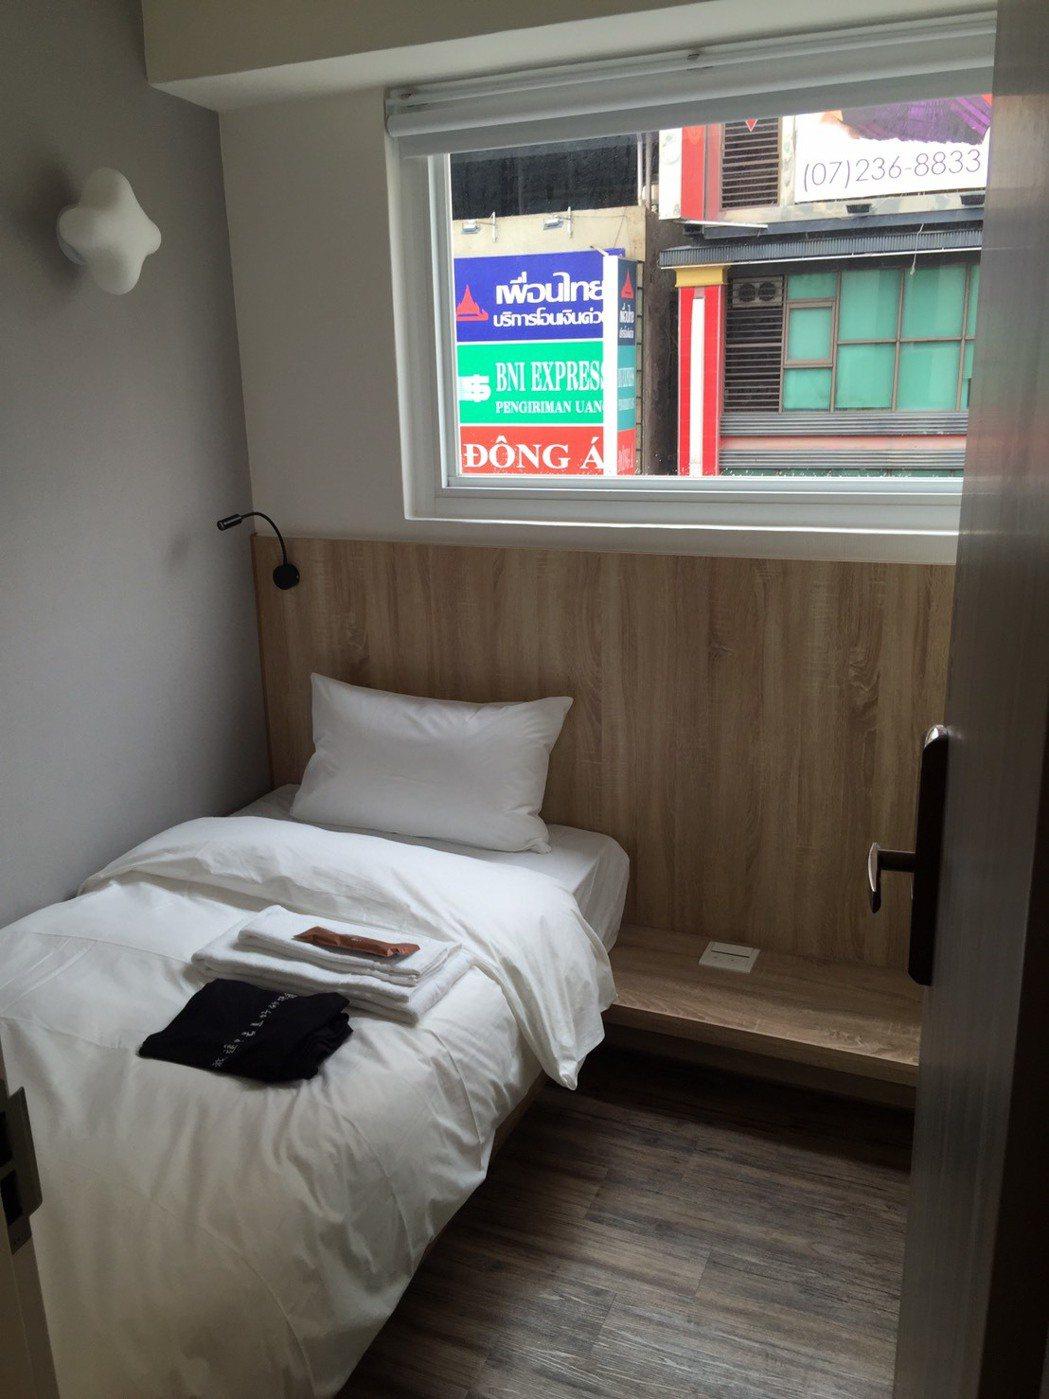 SINGLE INN單人房旅店專注服務一位客人。記者林政鋒攝影